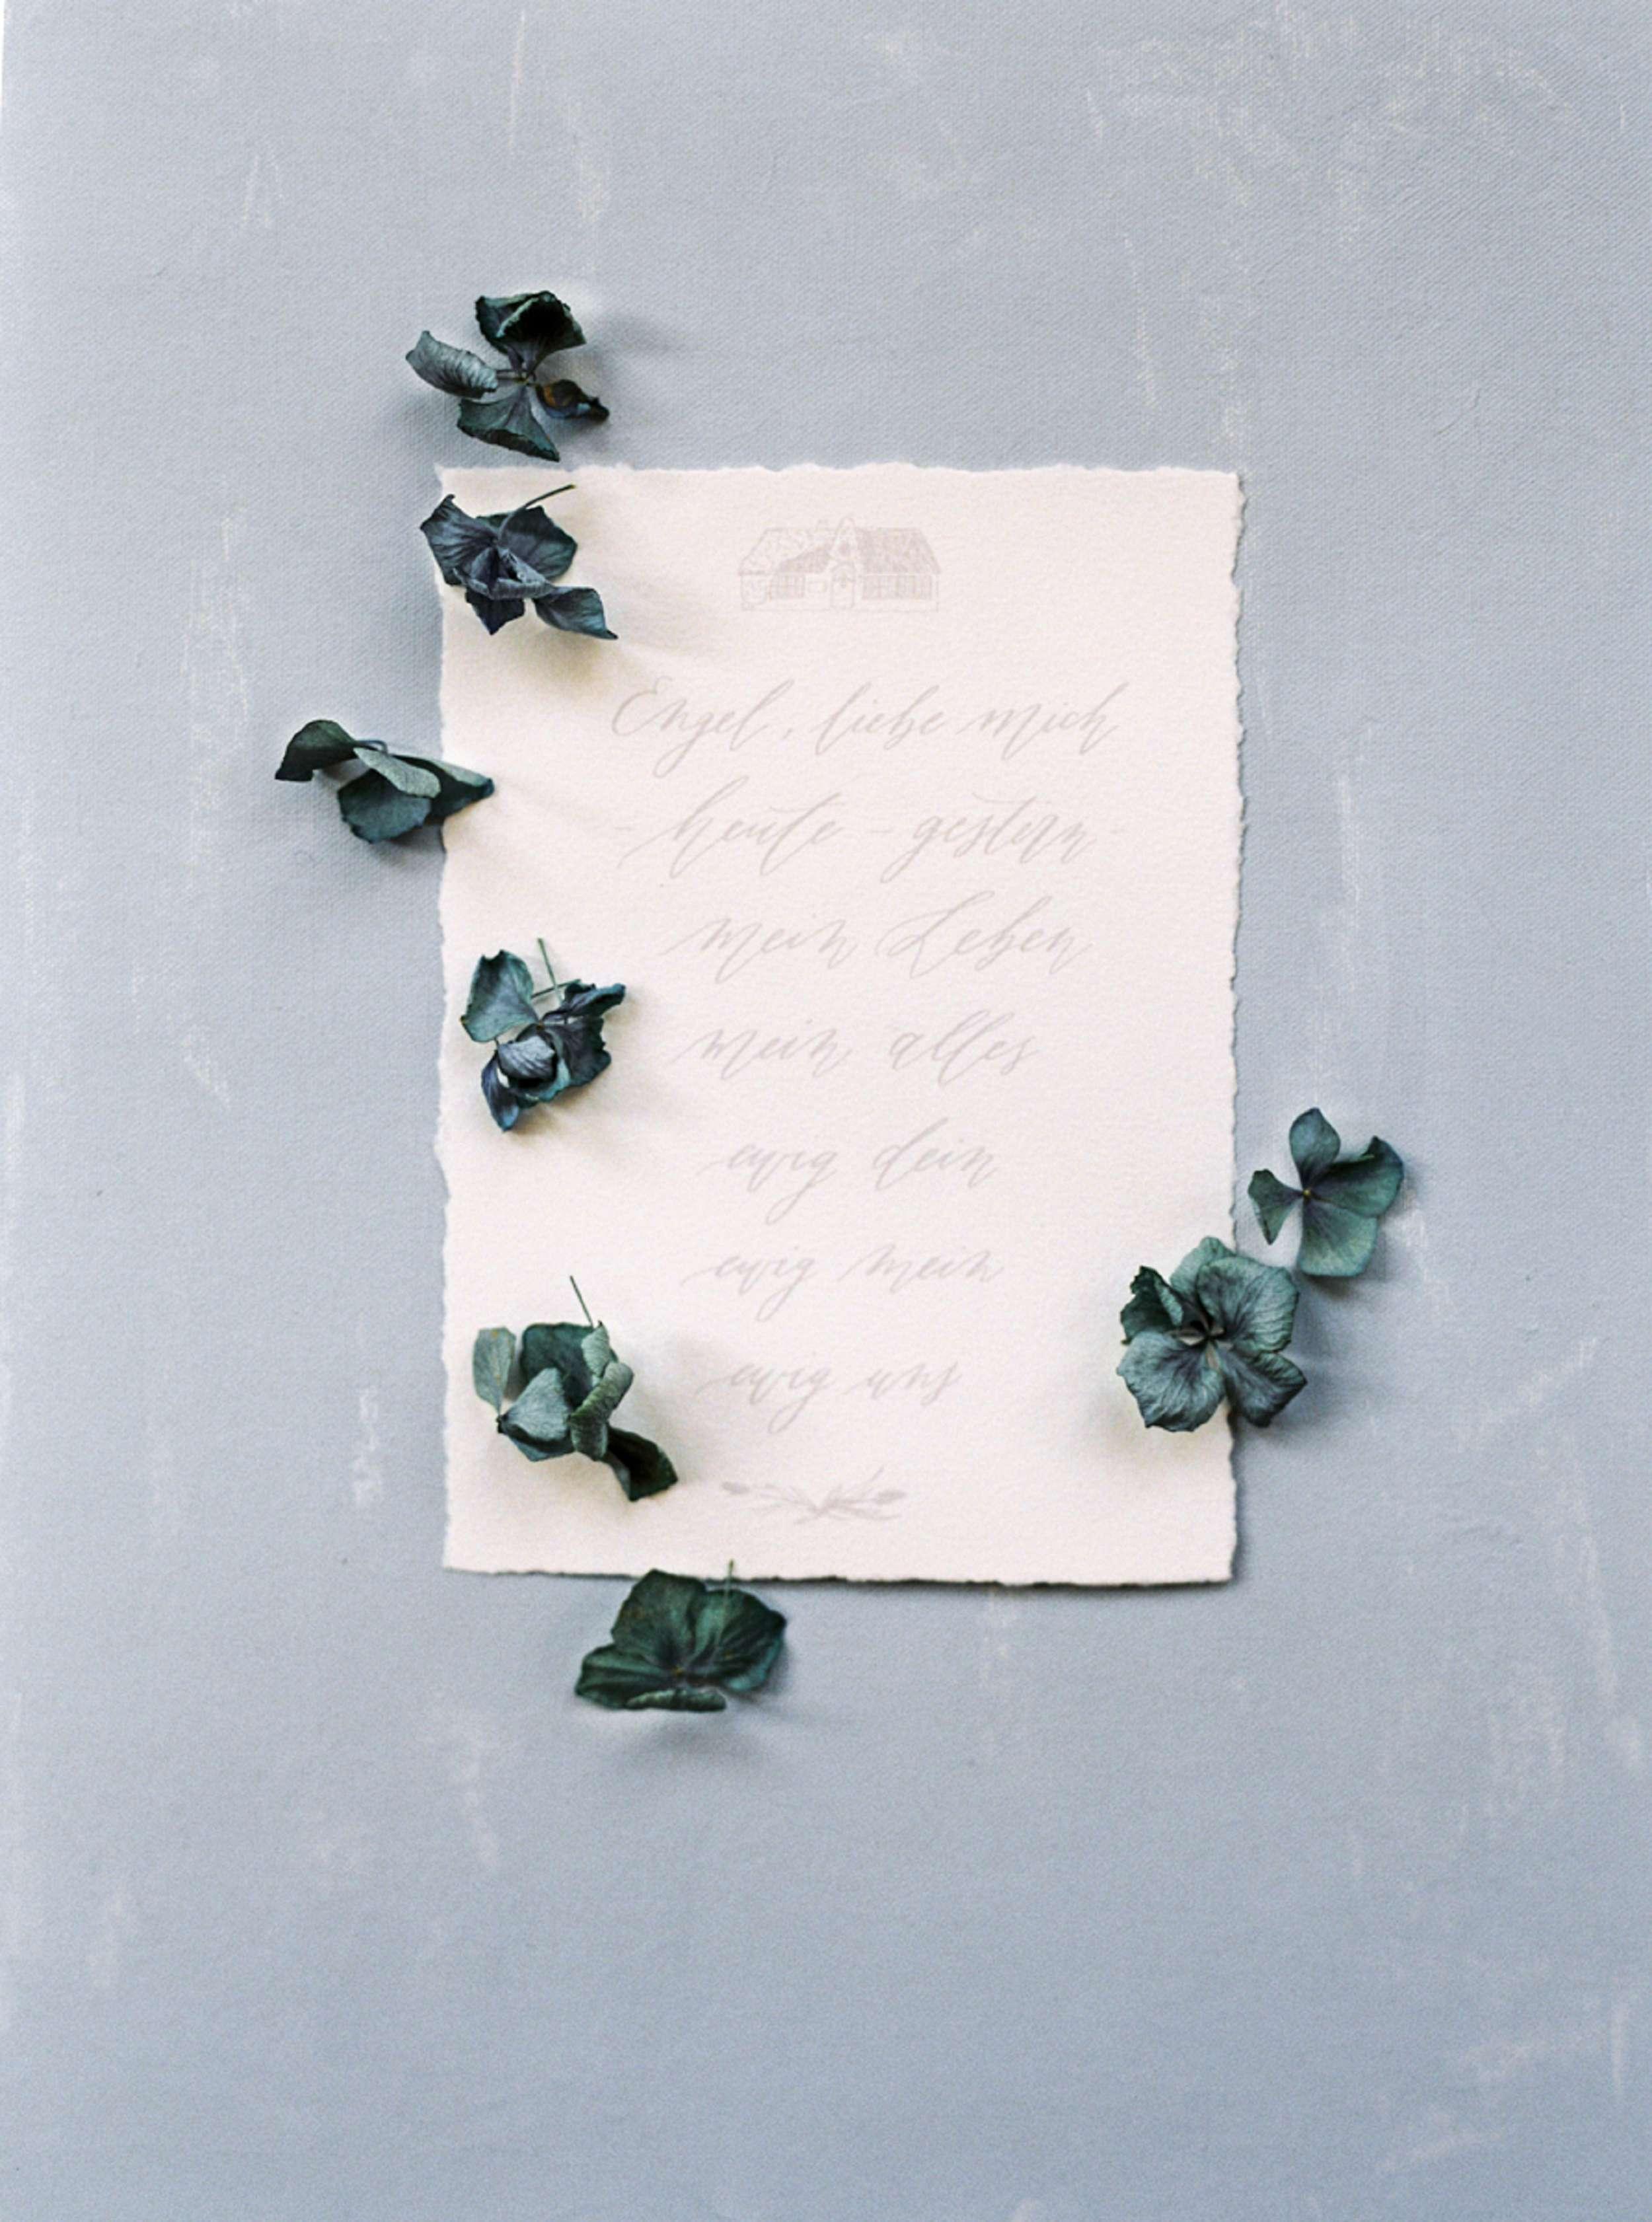 Modern wedding calligraphy in blue tones